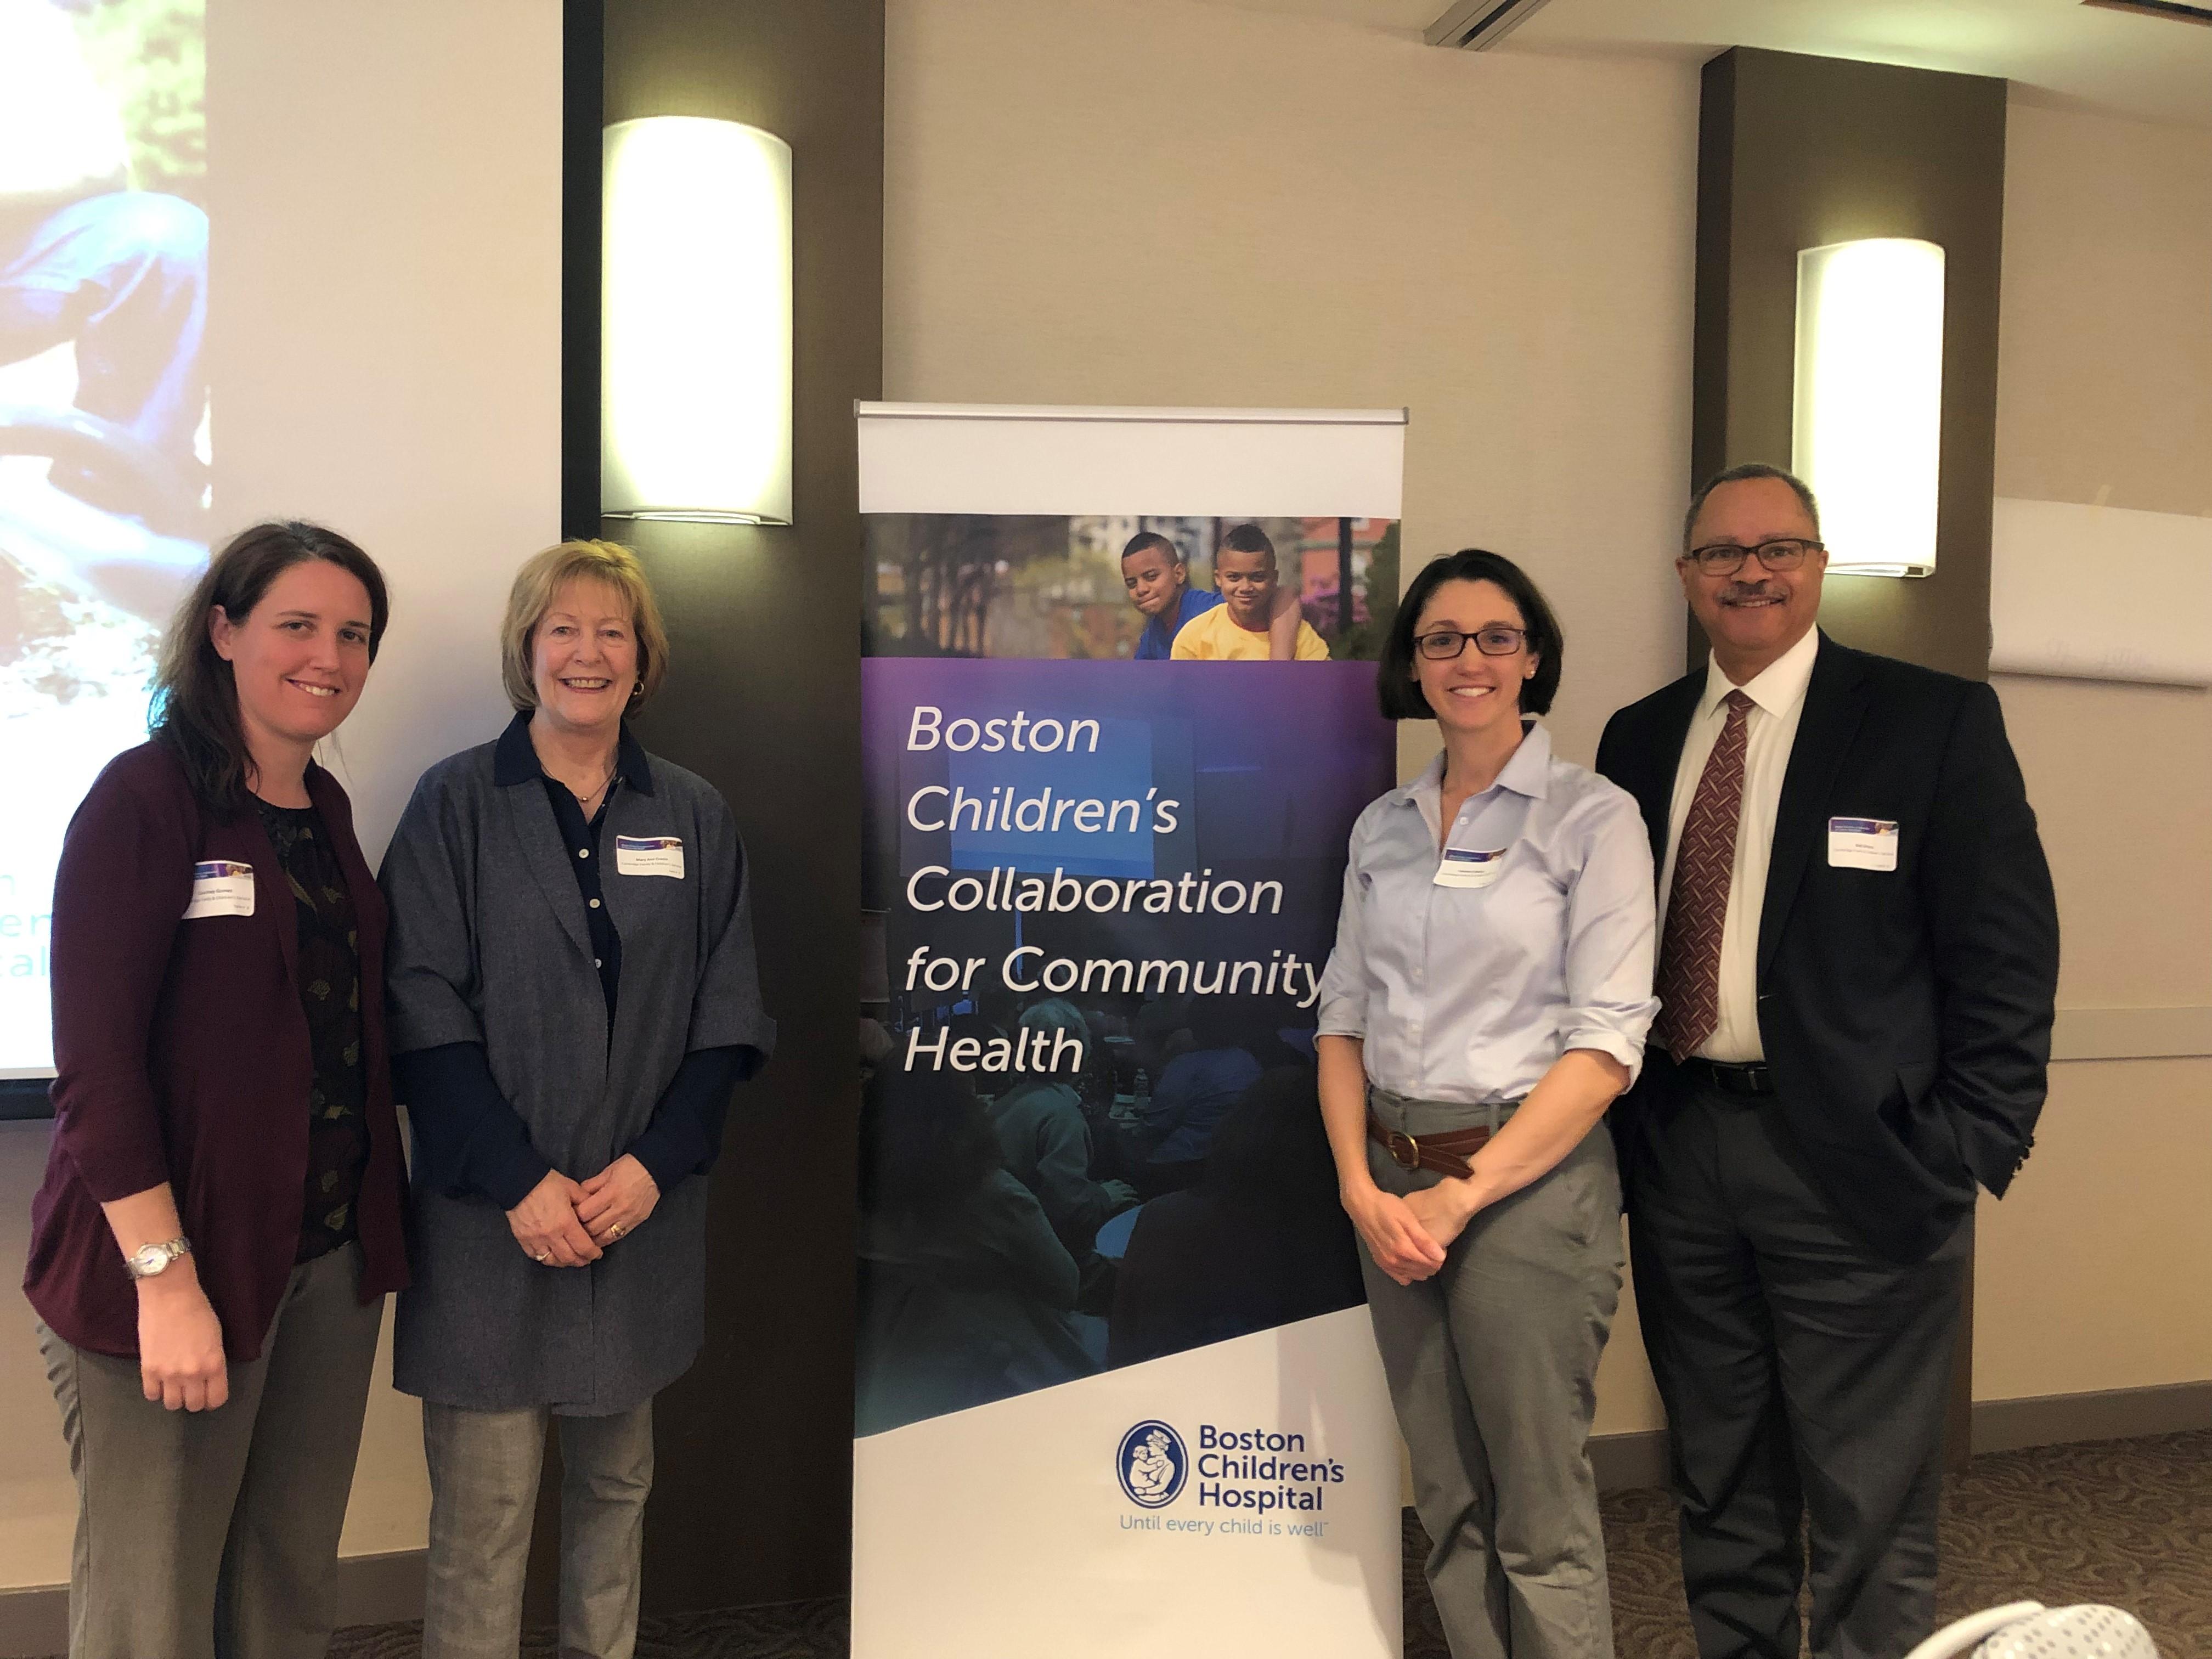 CFCS's Partnership with Boston Children's Hospital Kicks Off